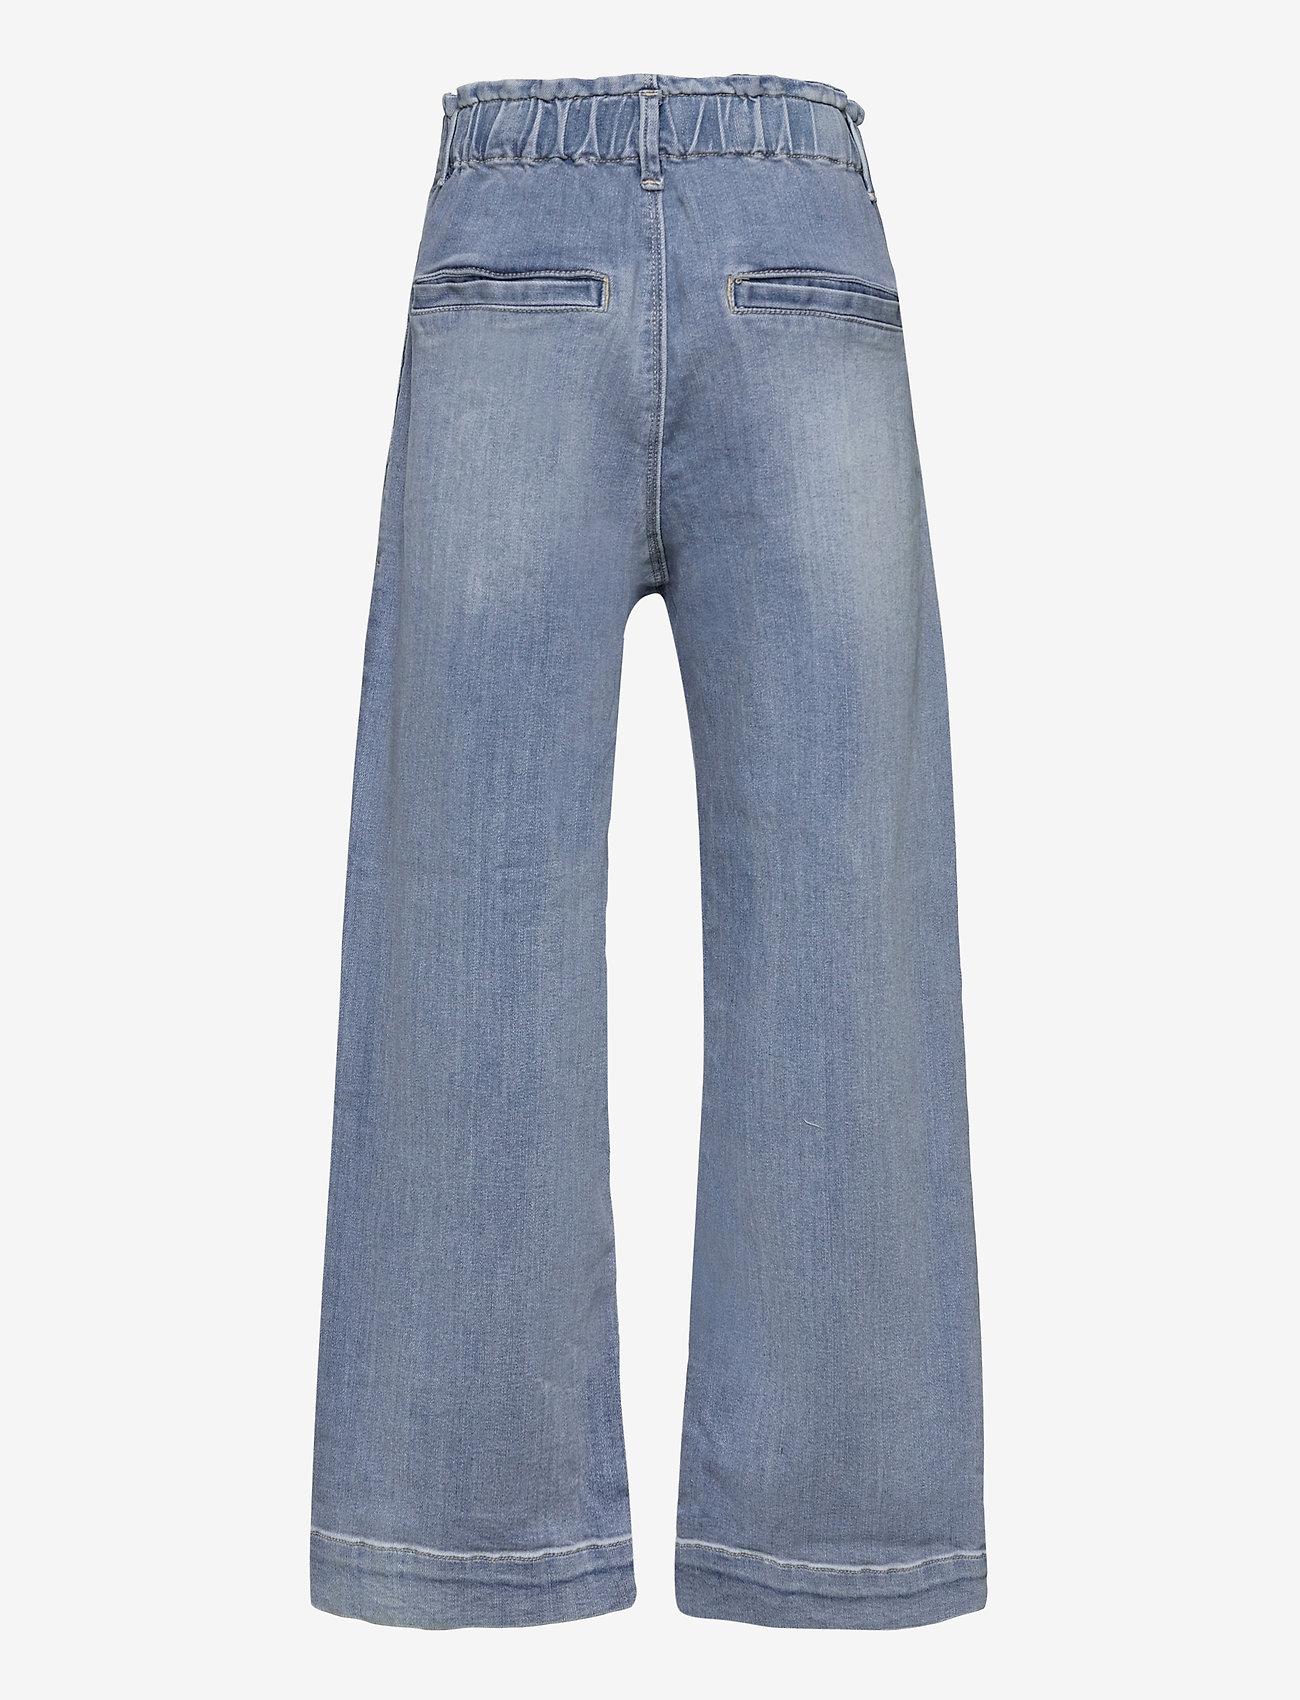 LMTD - NLFBIDE DNMATASPERS 1467 A PANT - jeans - light blue denim - 1